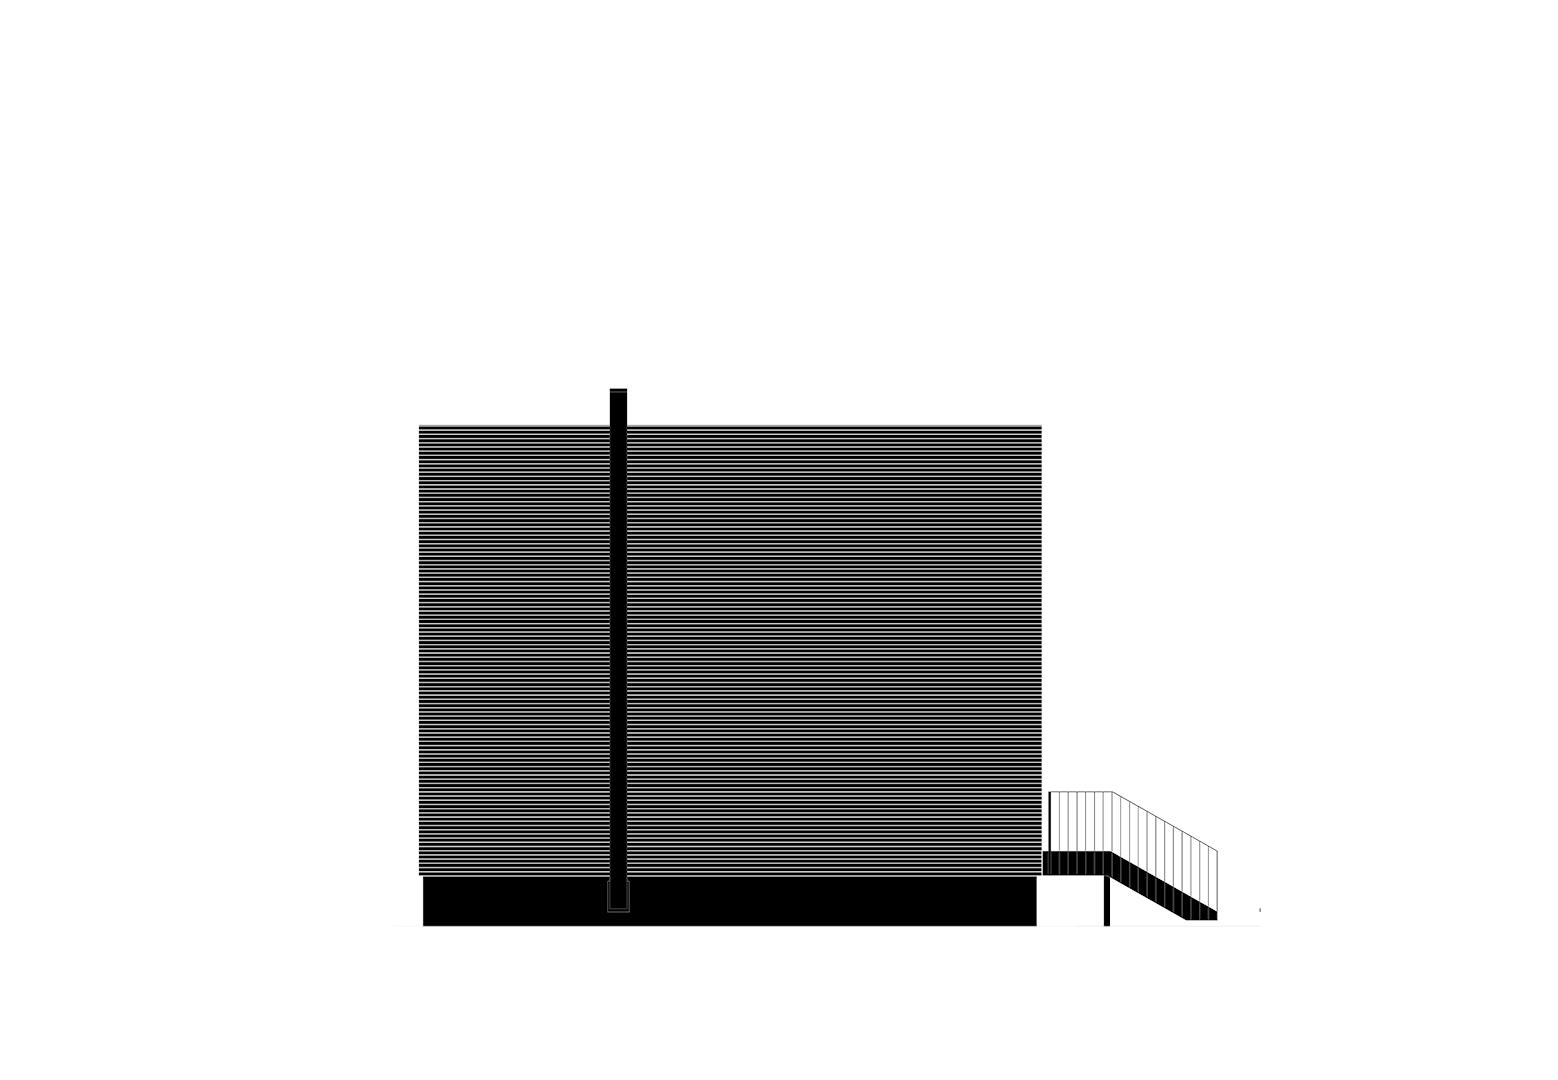 Haus KS, Berlin, Schnitt | Sauerzapfe Architekten